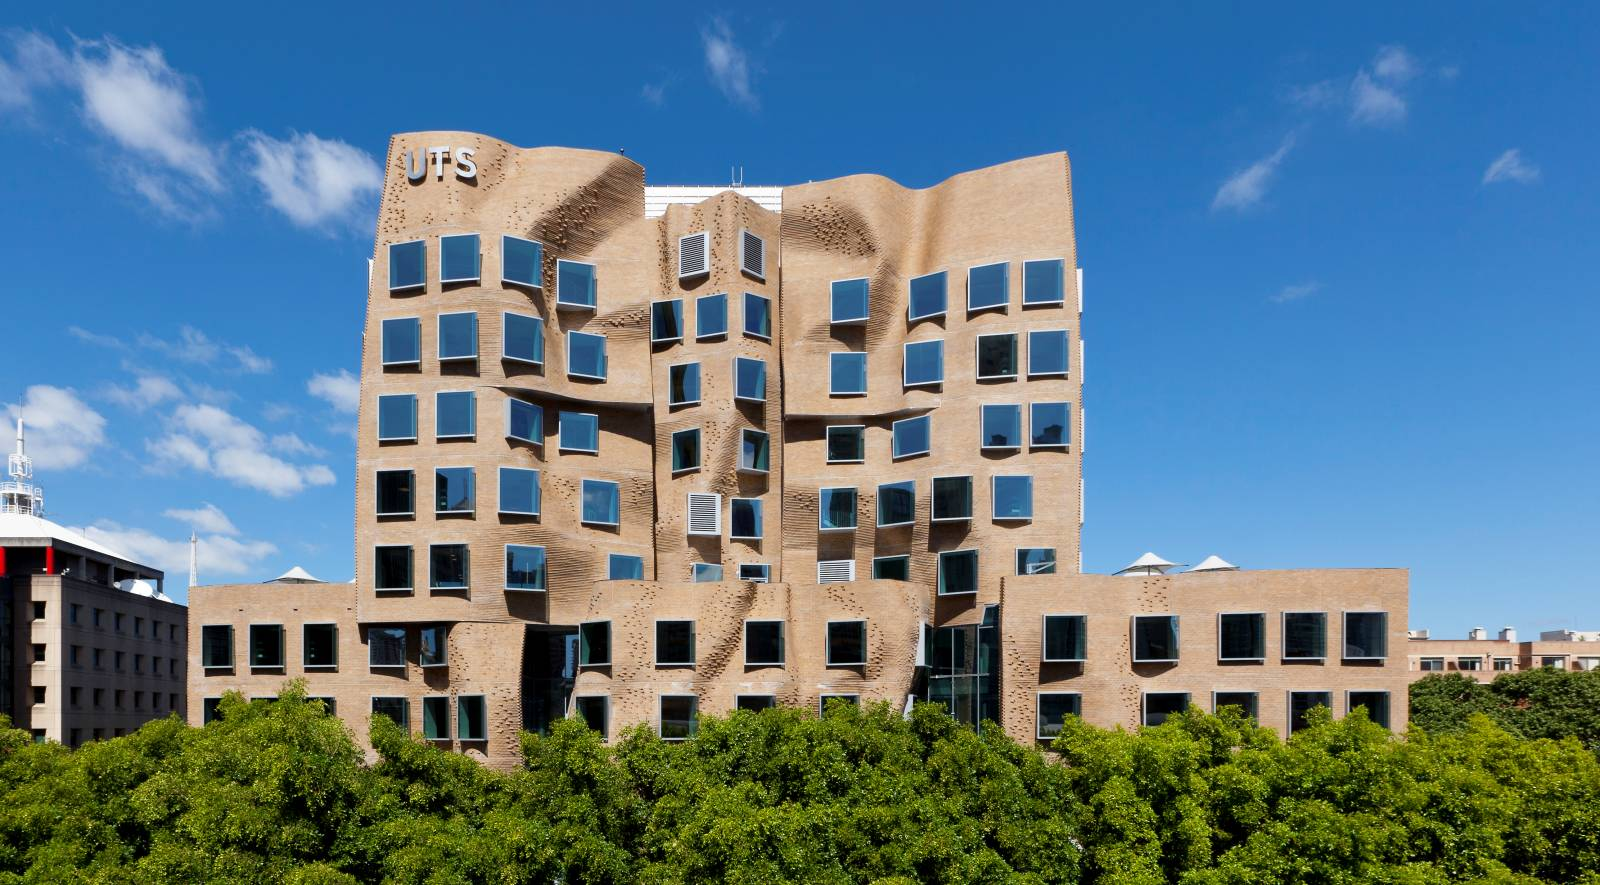 Dr-Chau-Chak-Wing-Building